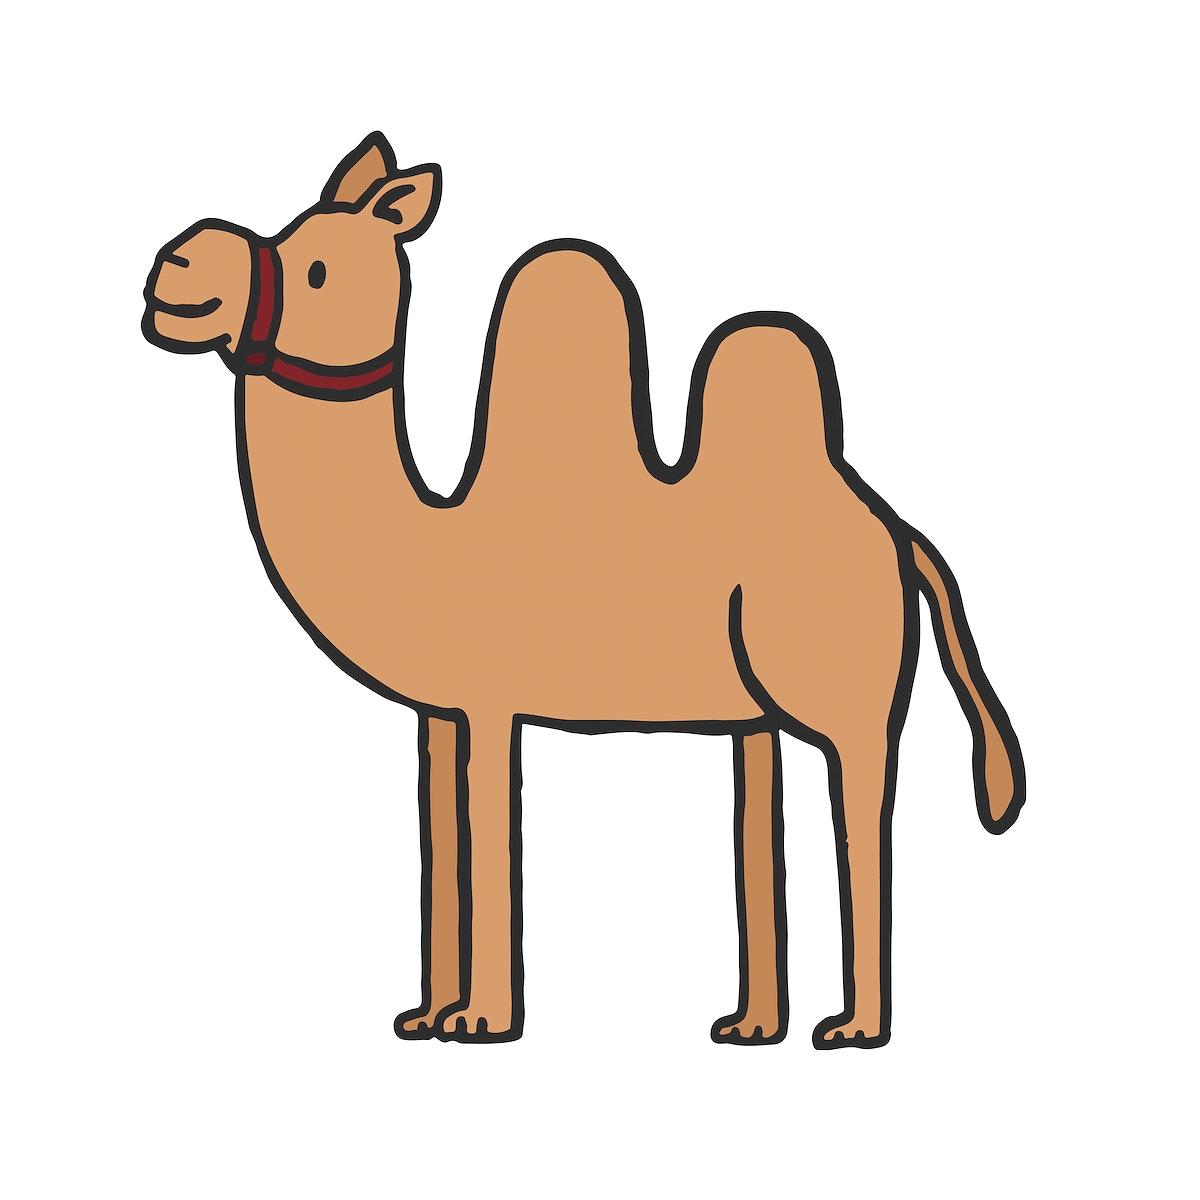 Hand drawn camel illustration